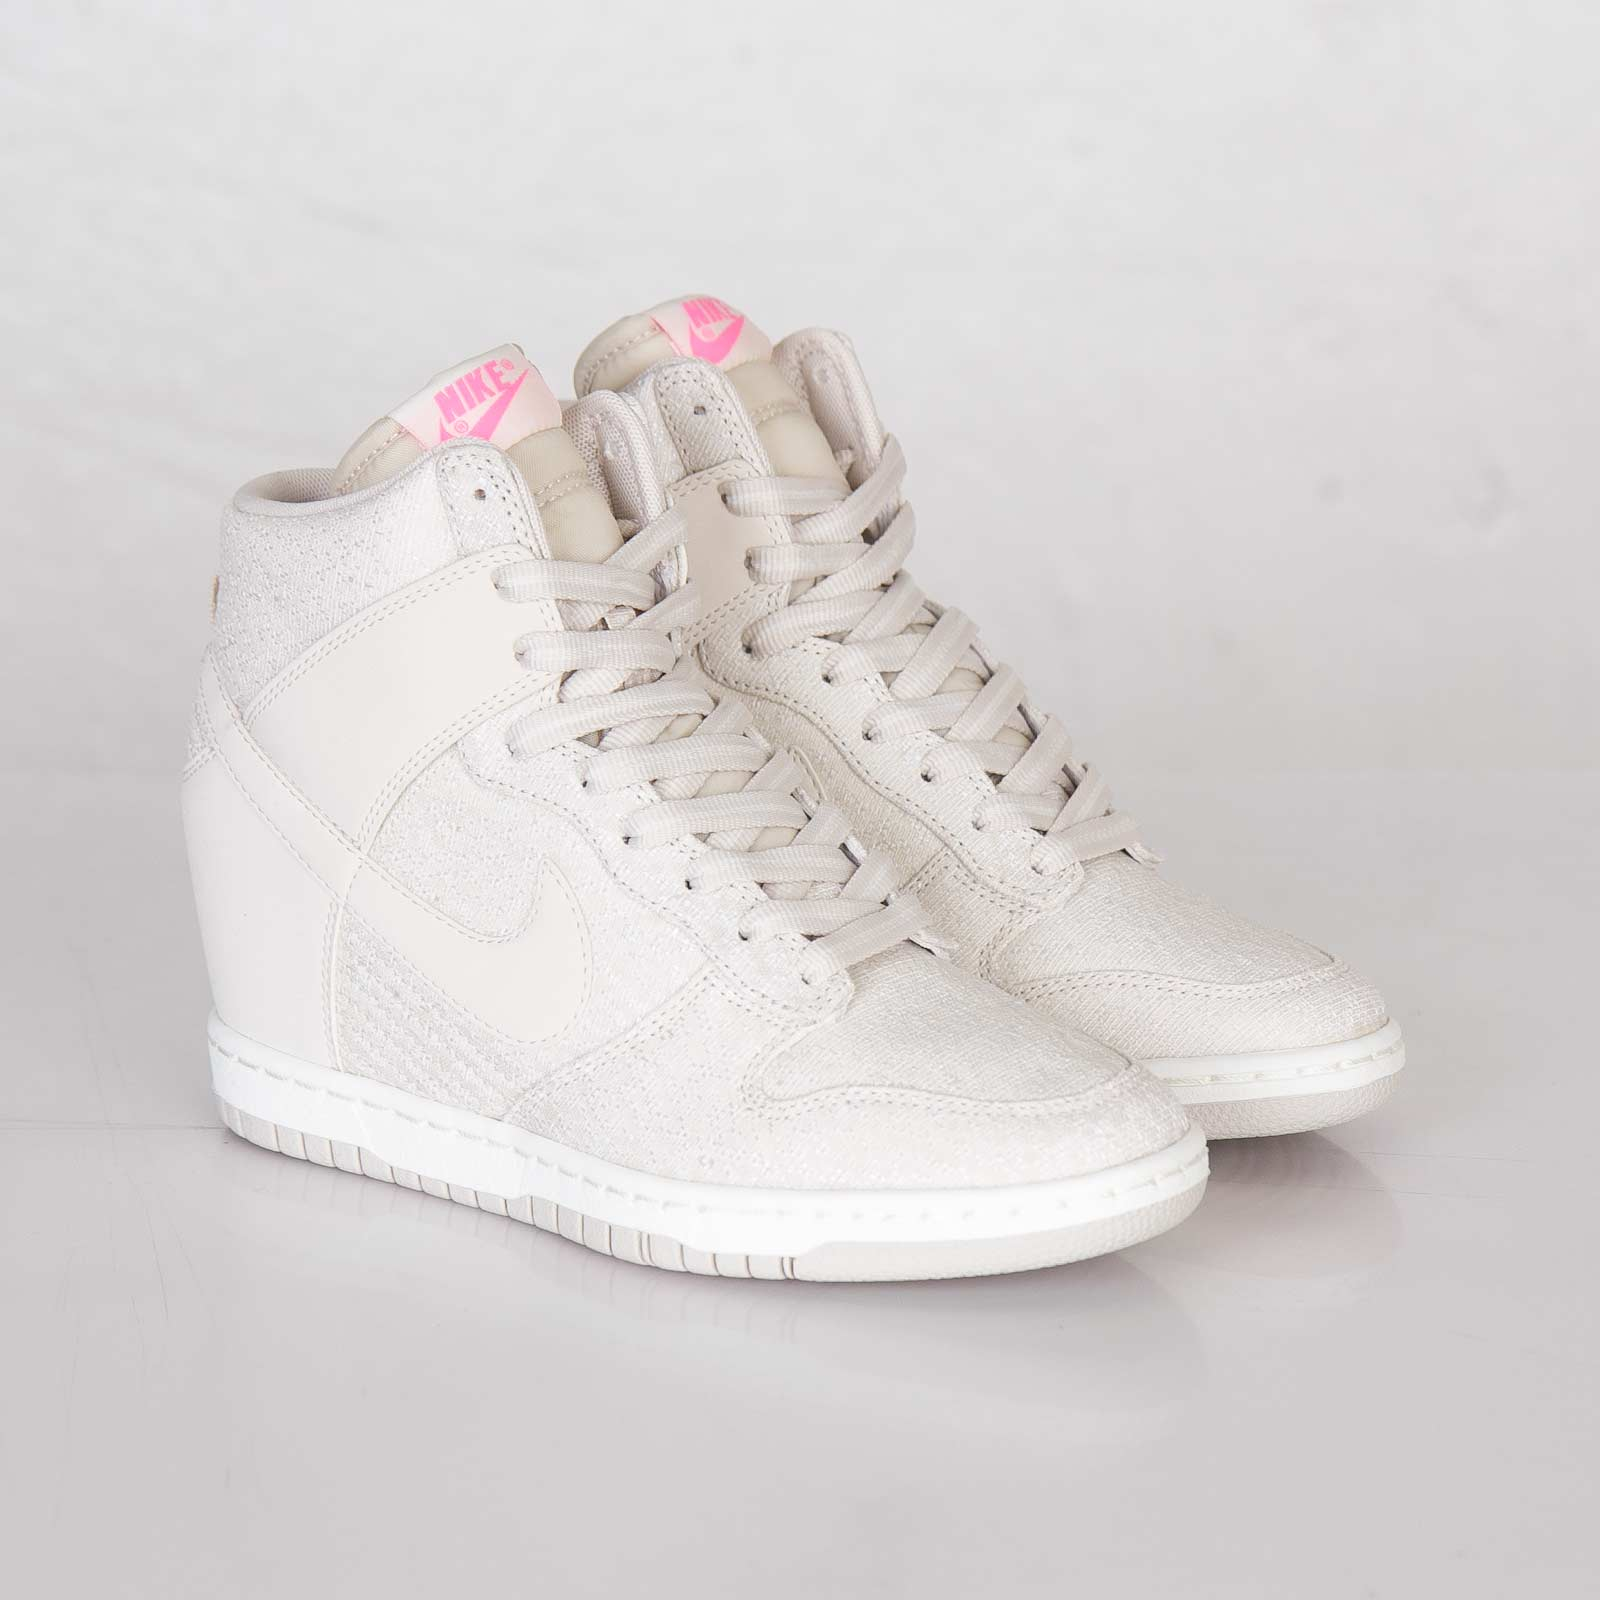 bbb7dbd085f ... wedge sneakers in tonal Nike Wmns Dunk Sky Hi Txt ...